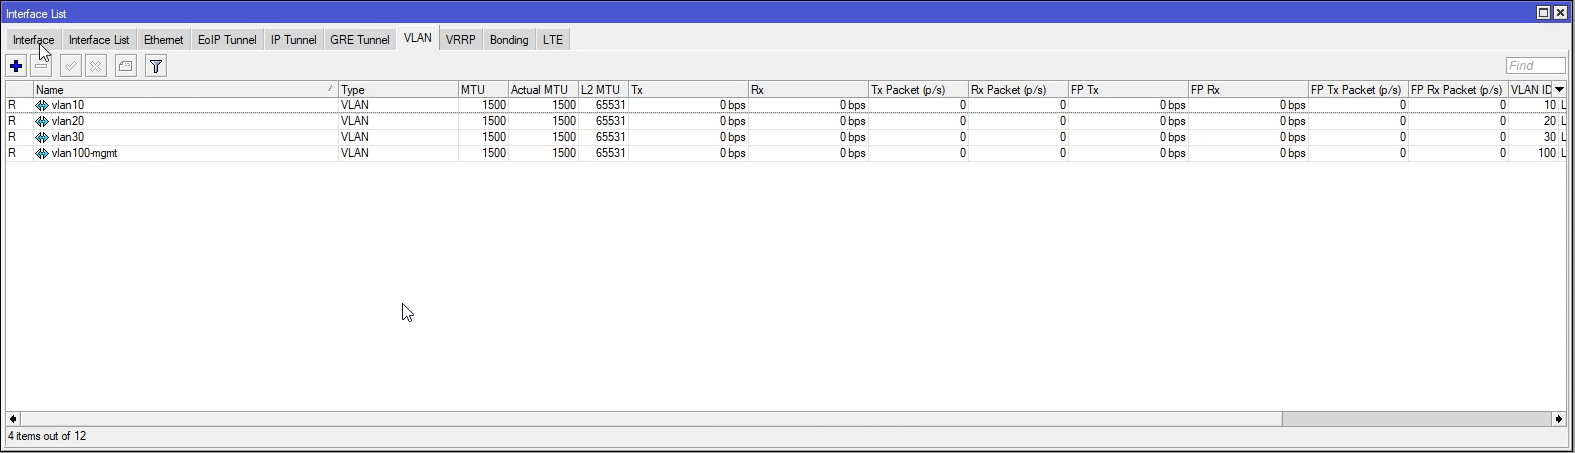 Mikrotik lista interfejsów vlan